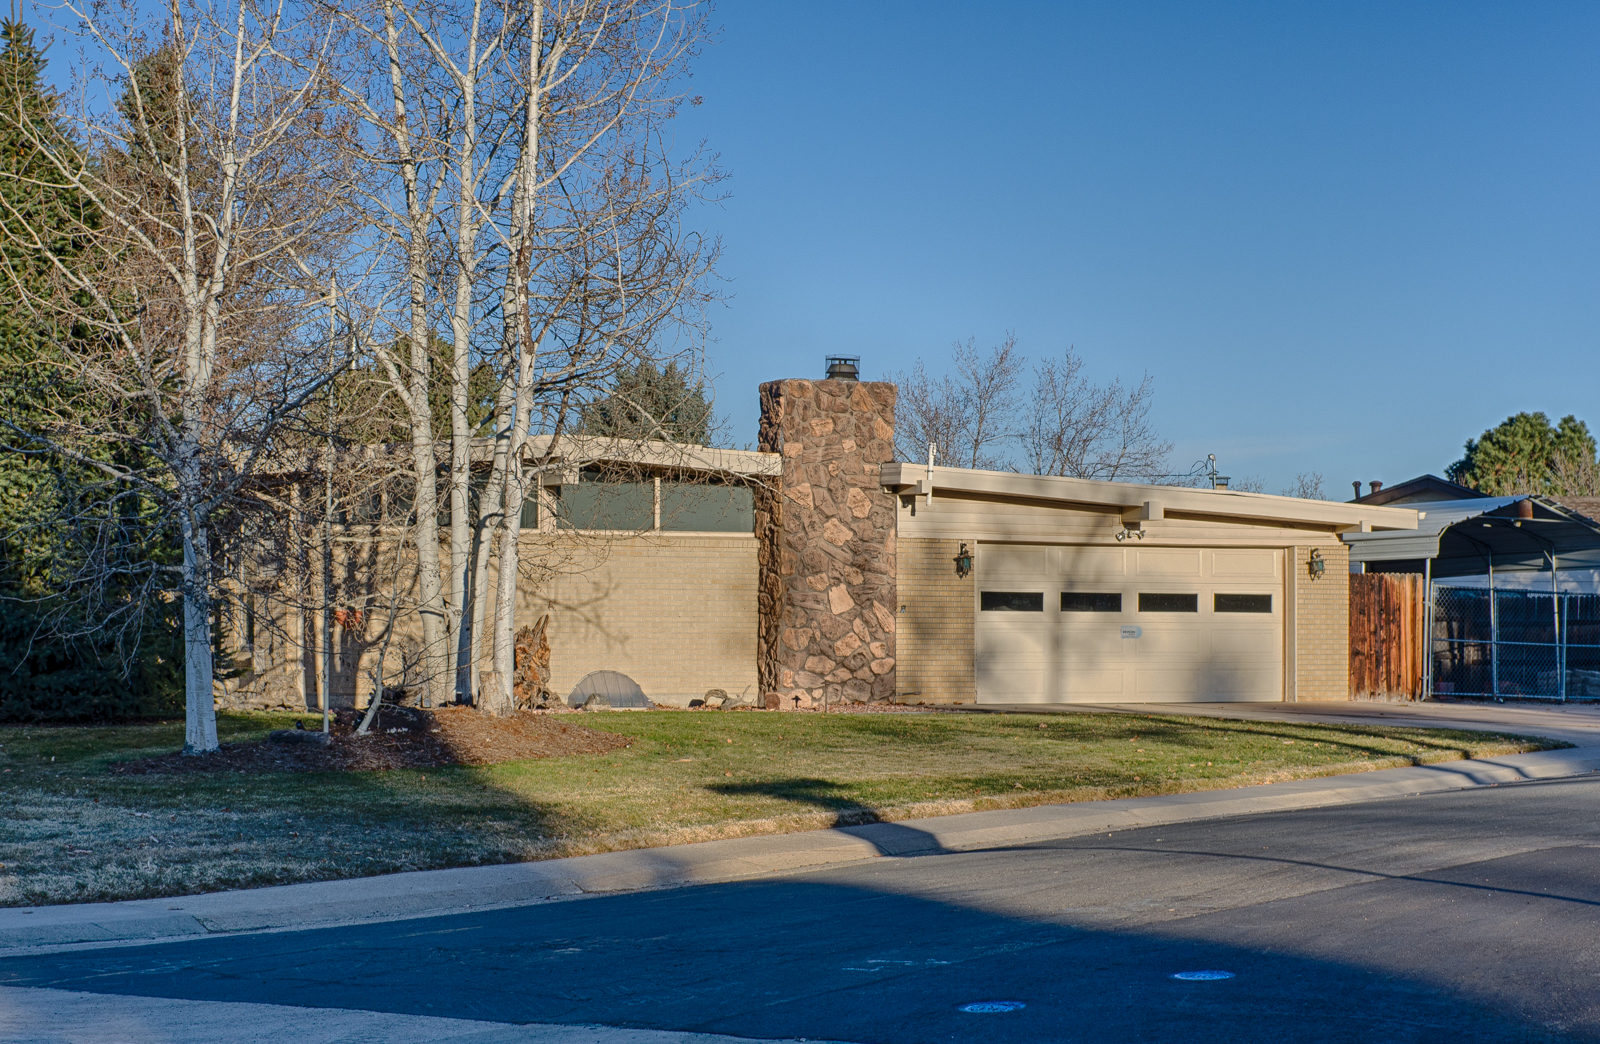 Adrian-Kinney-Dream-House-Acres-9.jpg